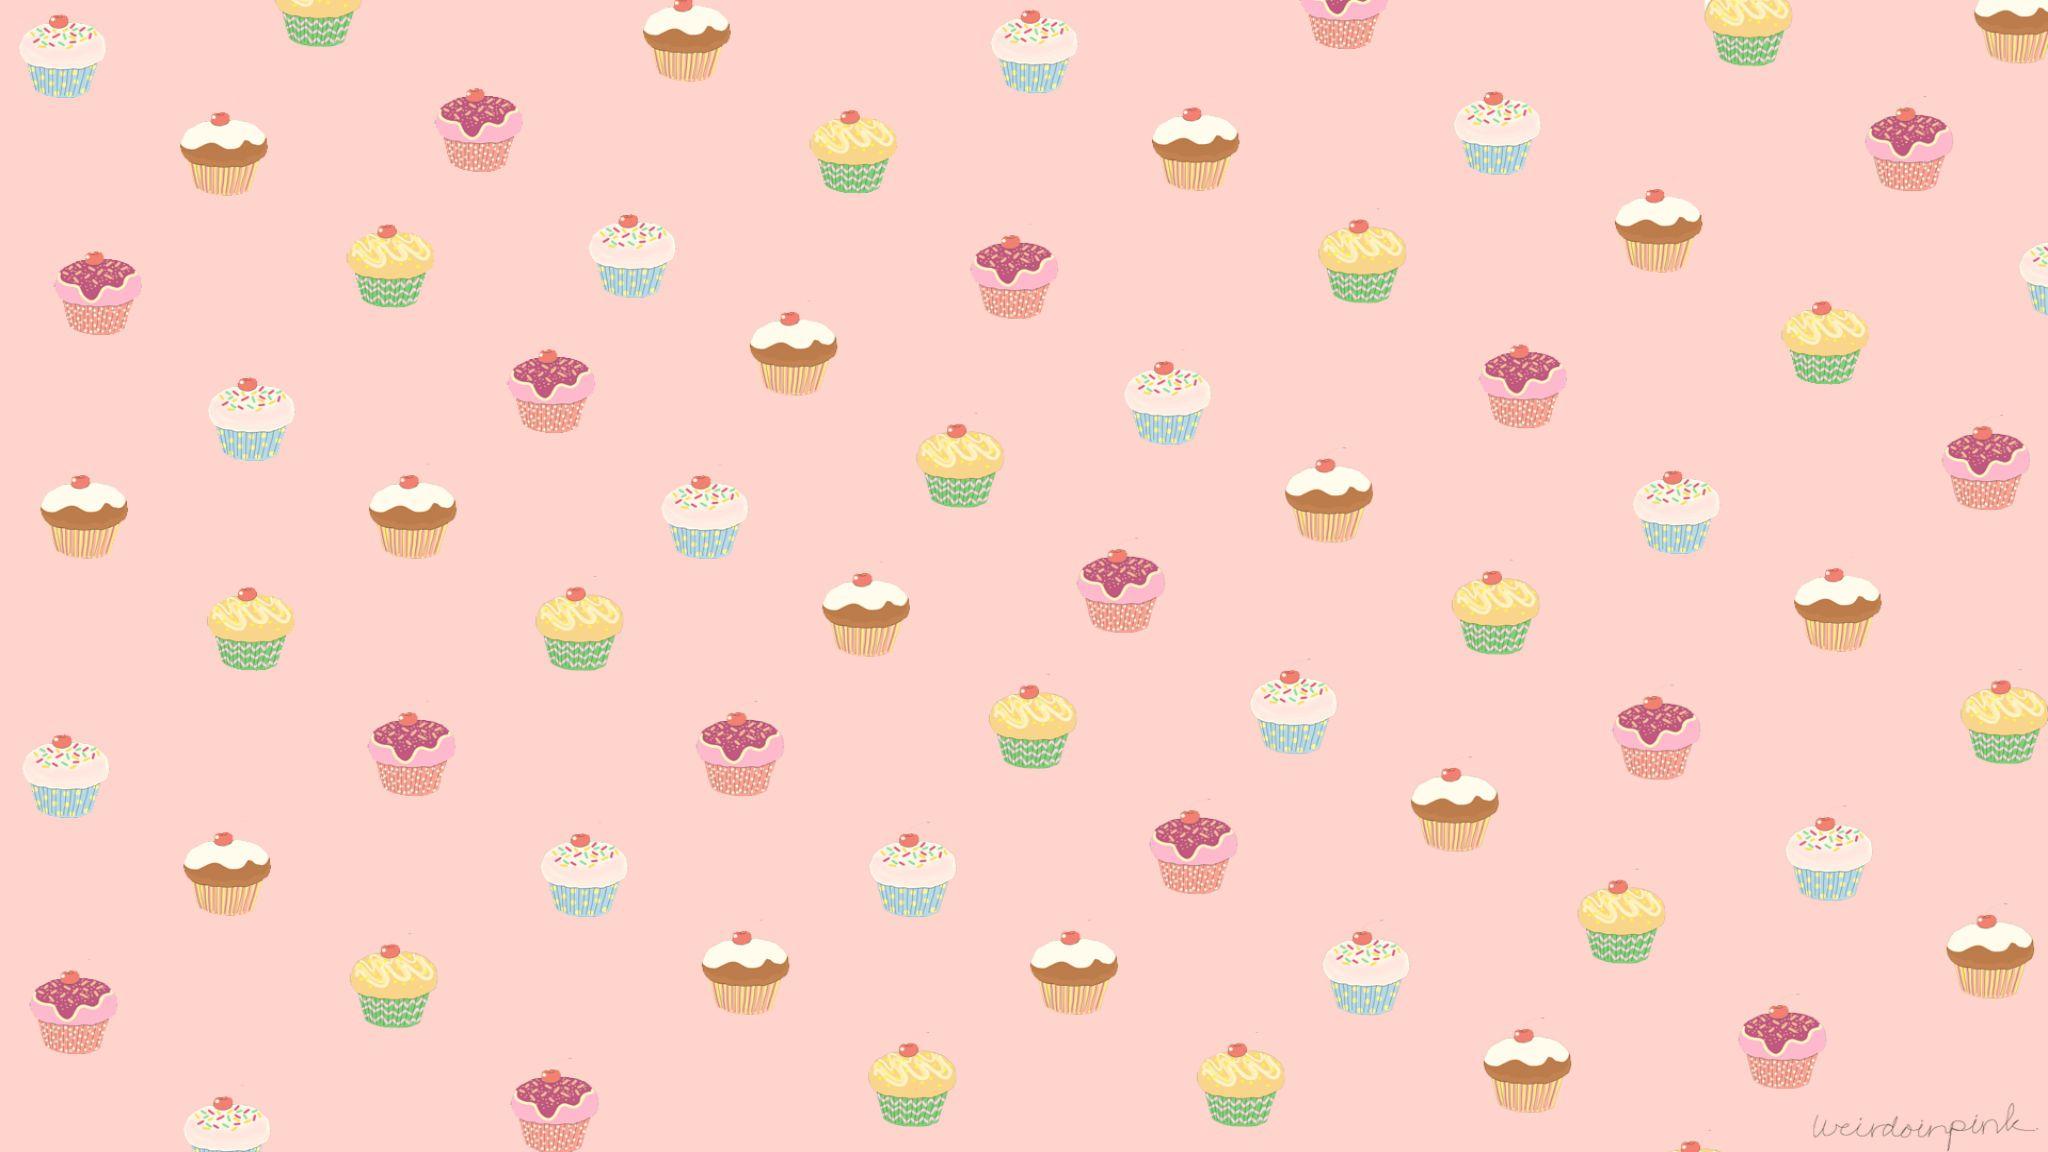 2048x1152 Cupcakes Cute Little Things Wallpaper Cupcakes